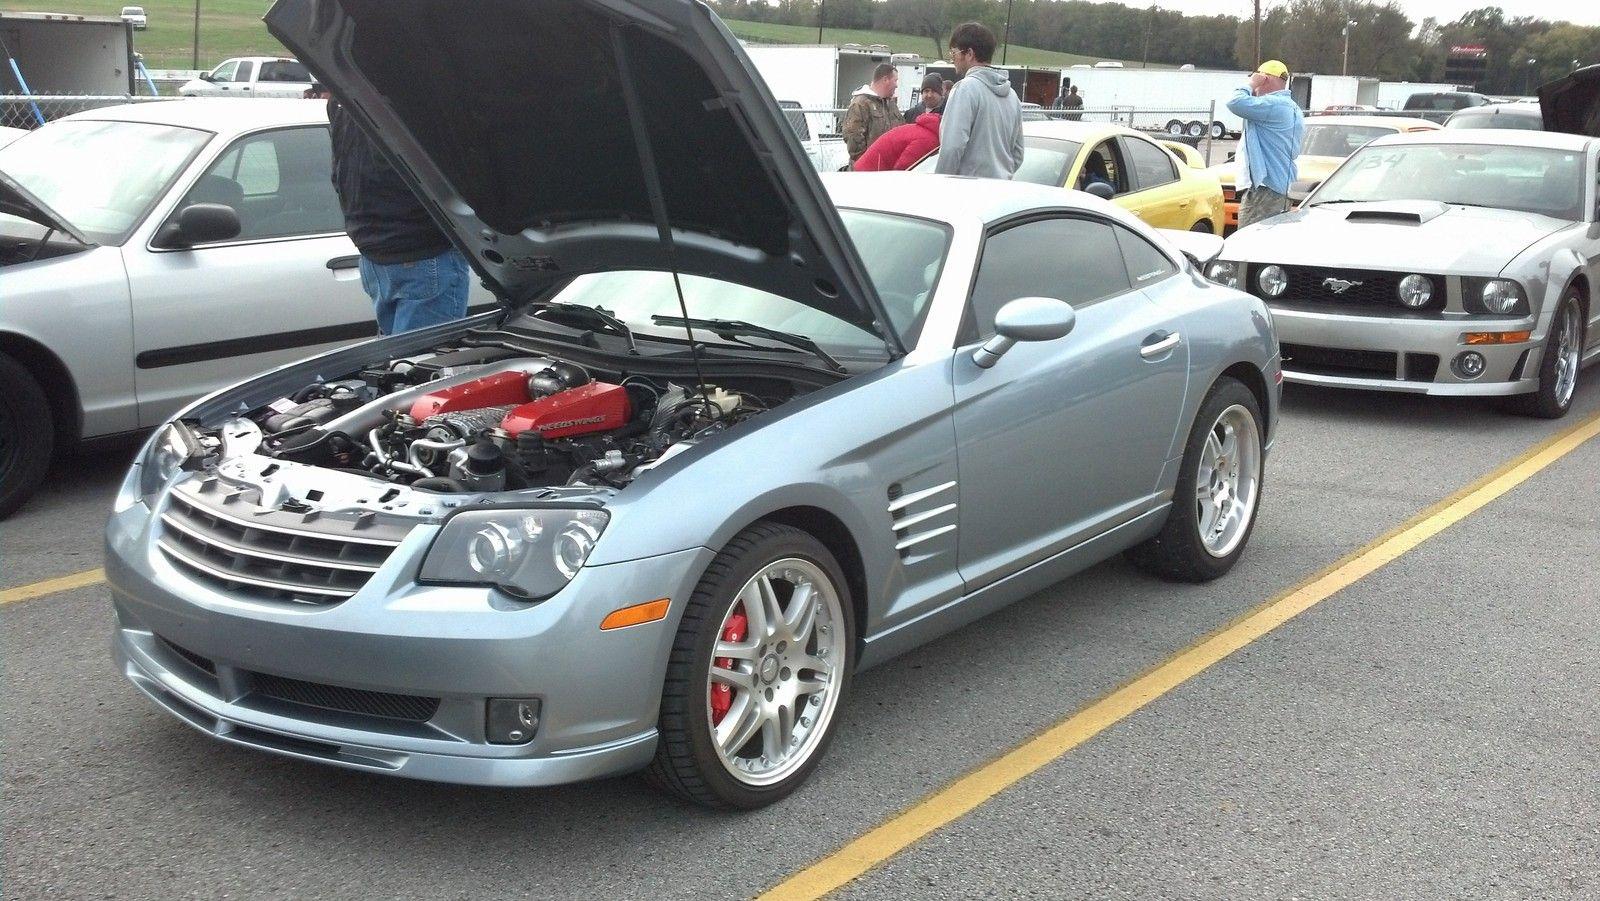 2005 Chrysler Crossfire Srt6 1 4 Mile Drag Racing Hot Rods